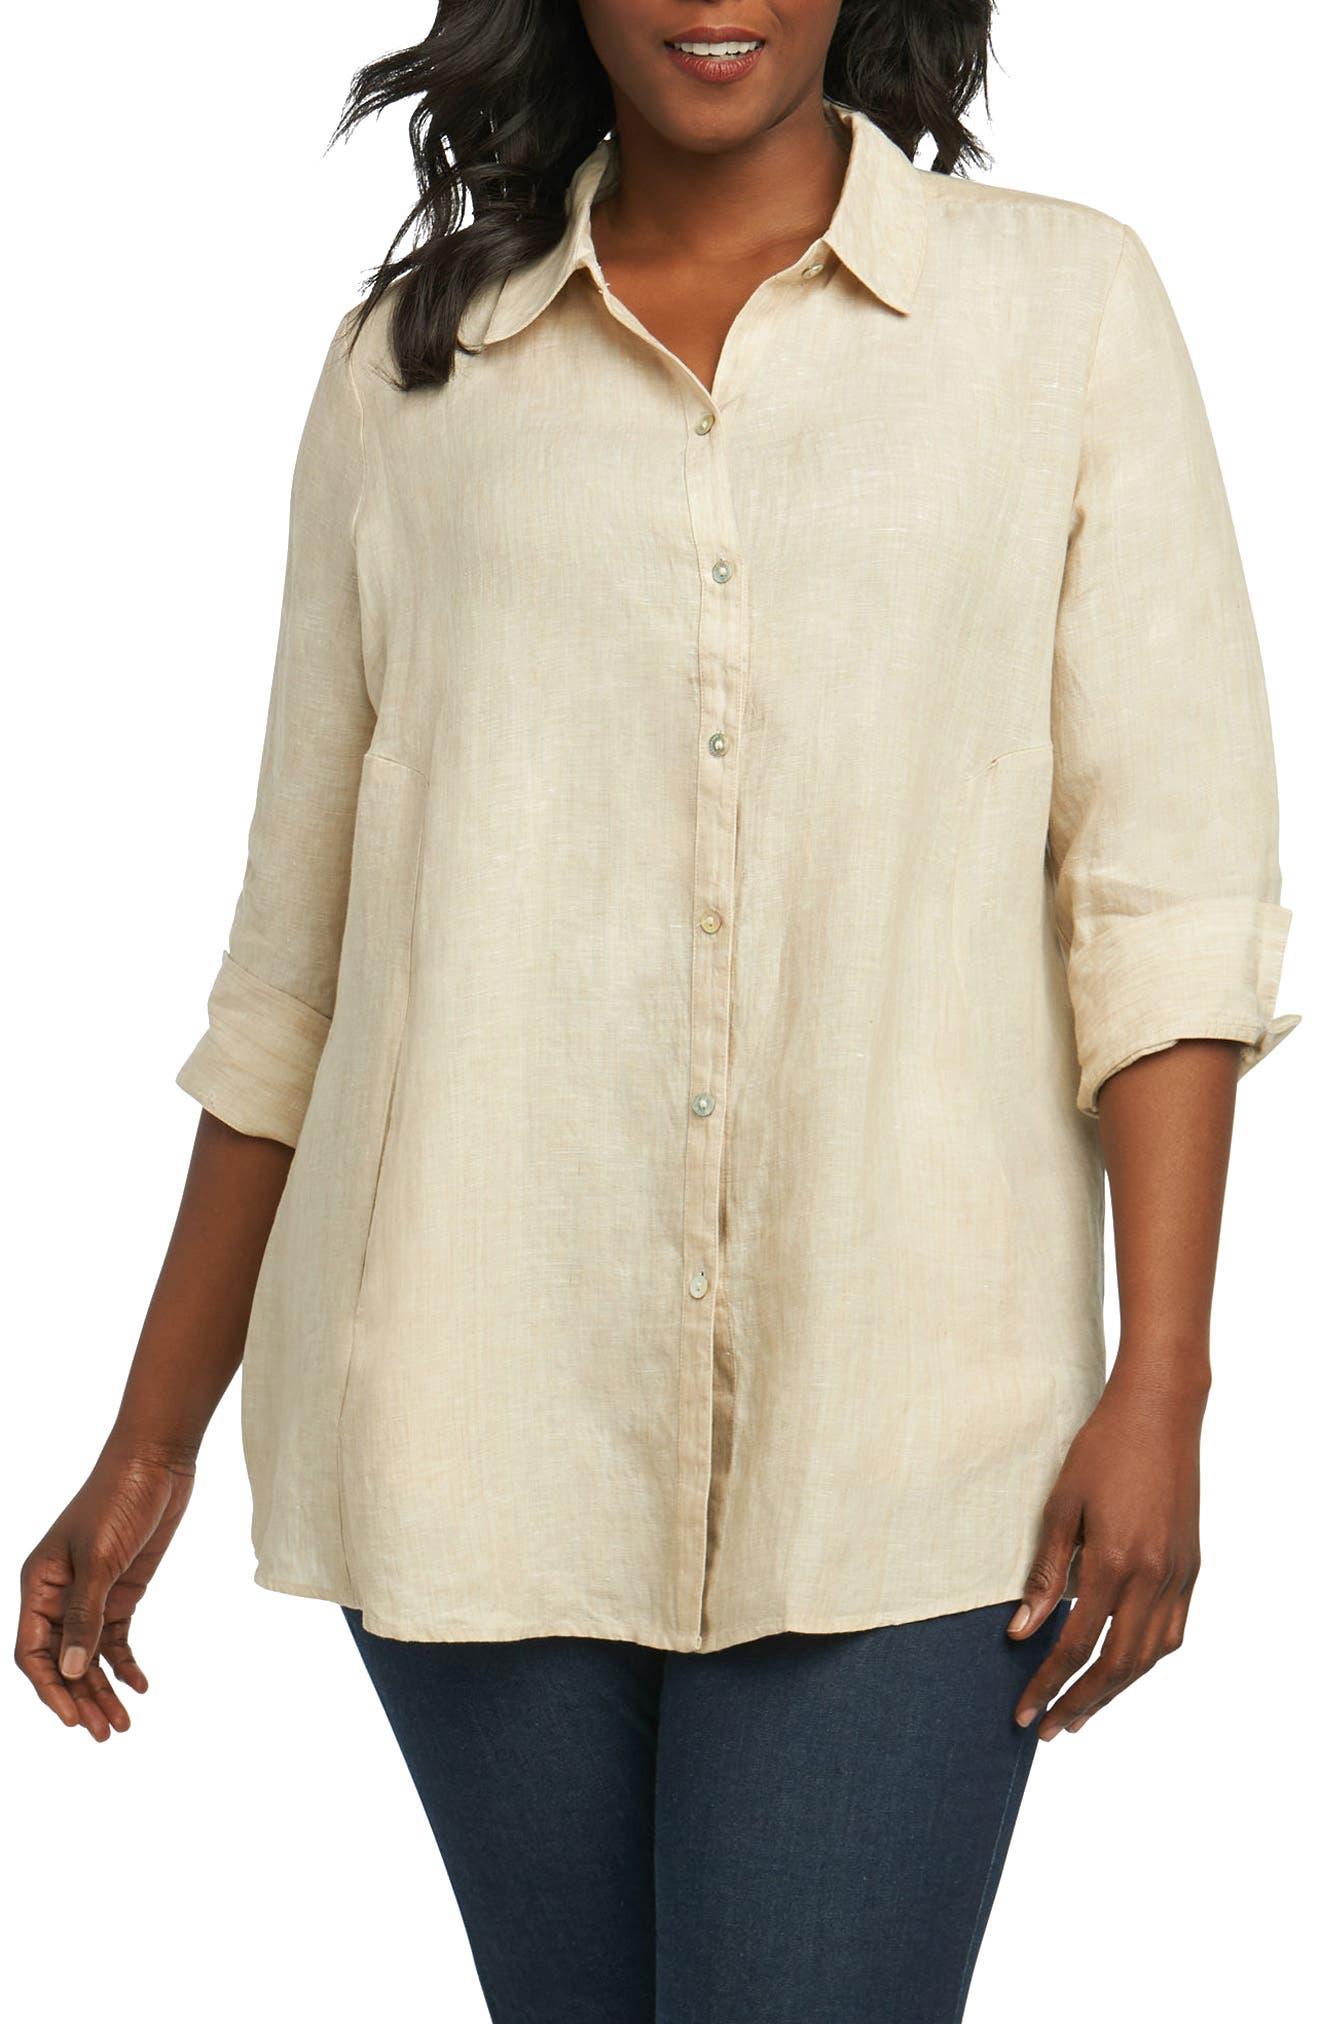 Cici Linen Chambray Shirt,                         Main,                         color, Flax